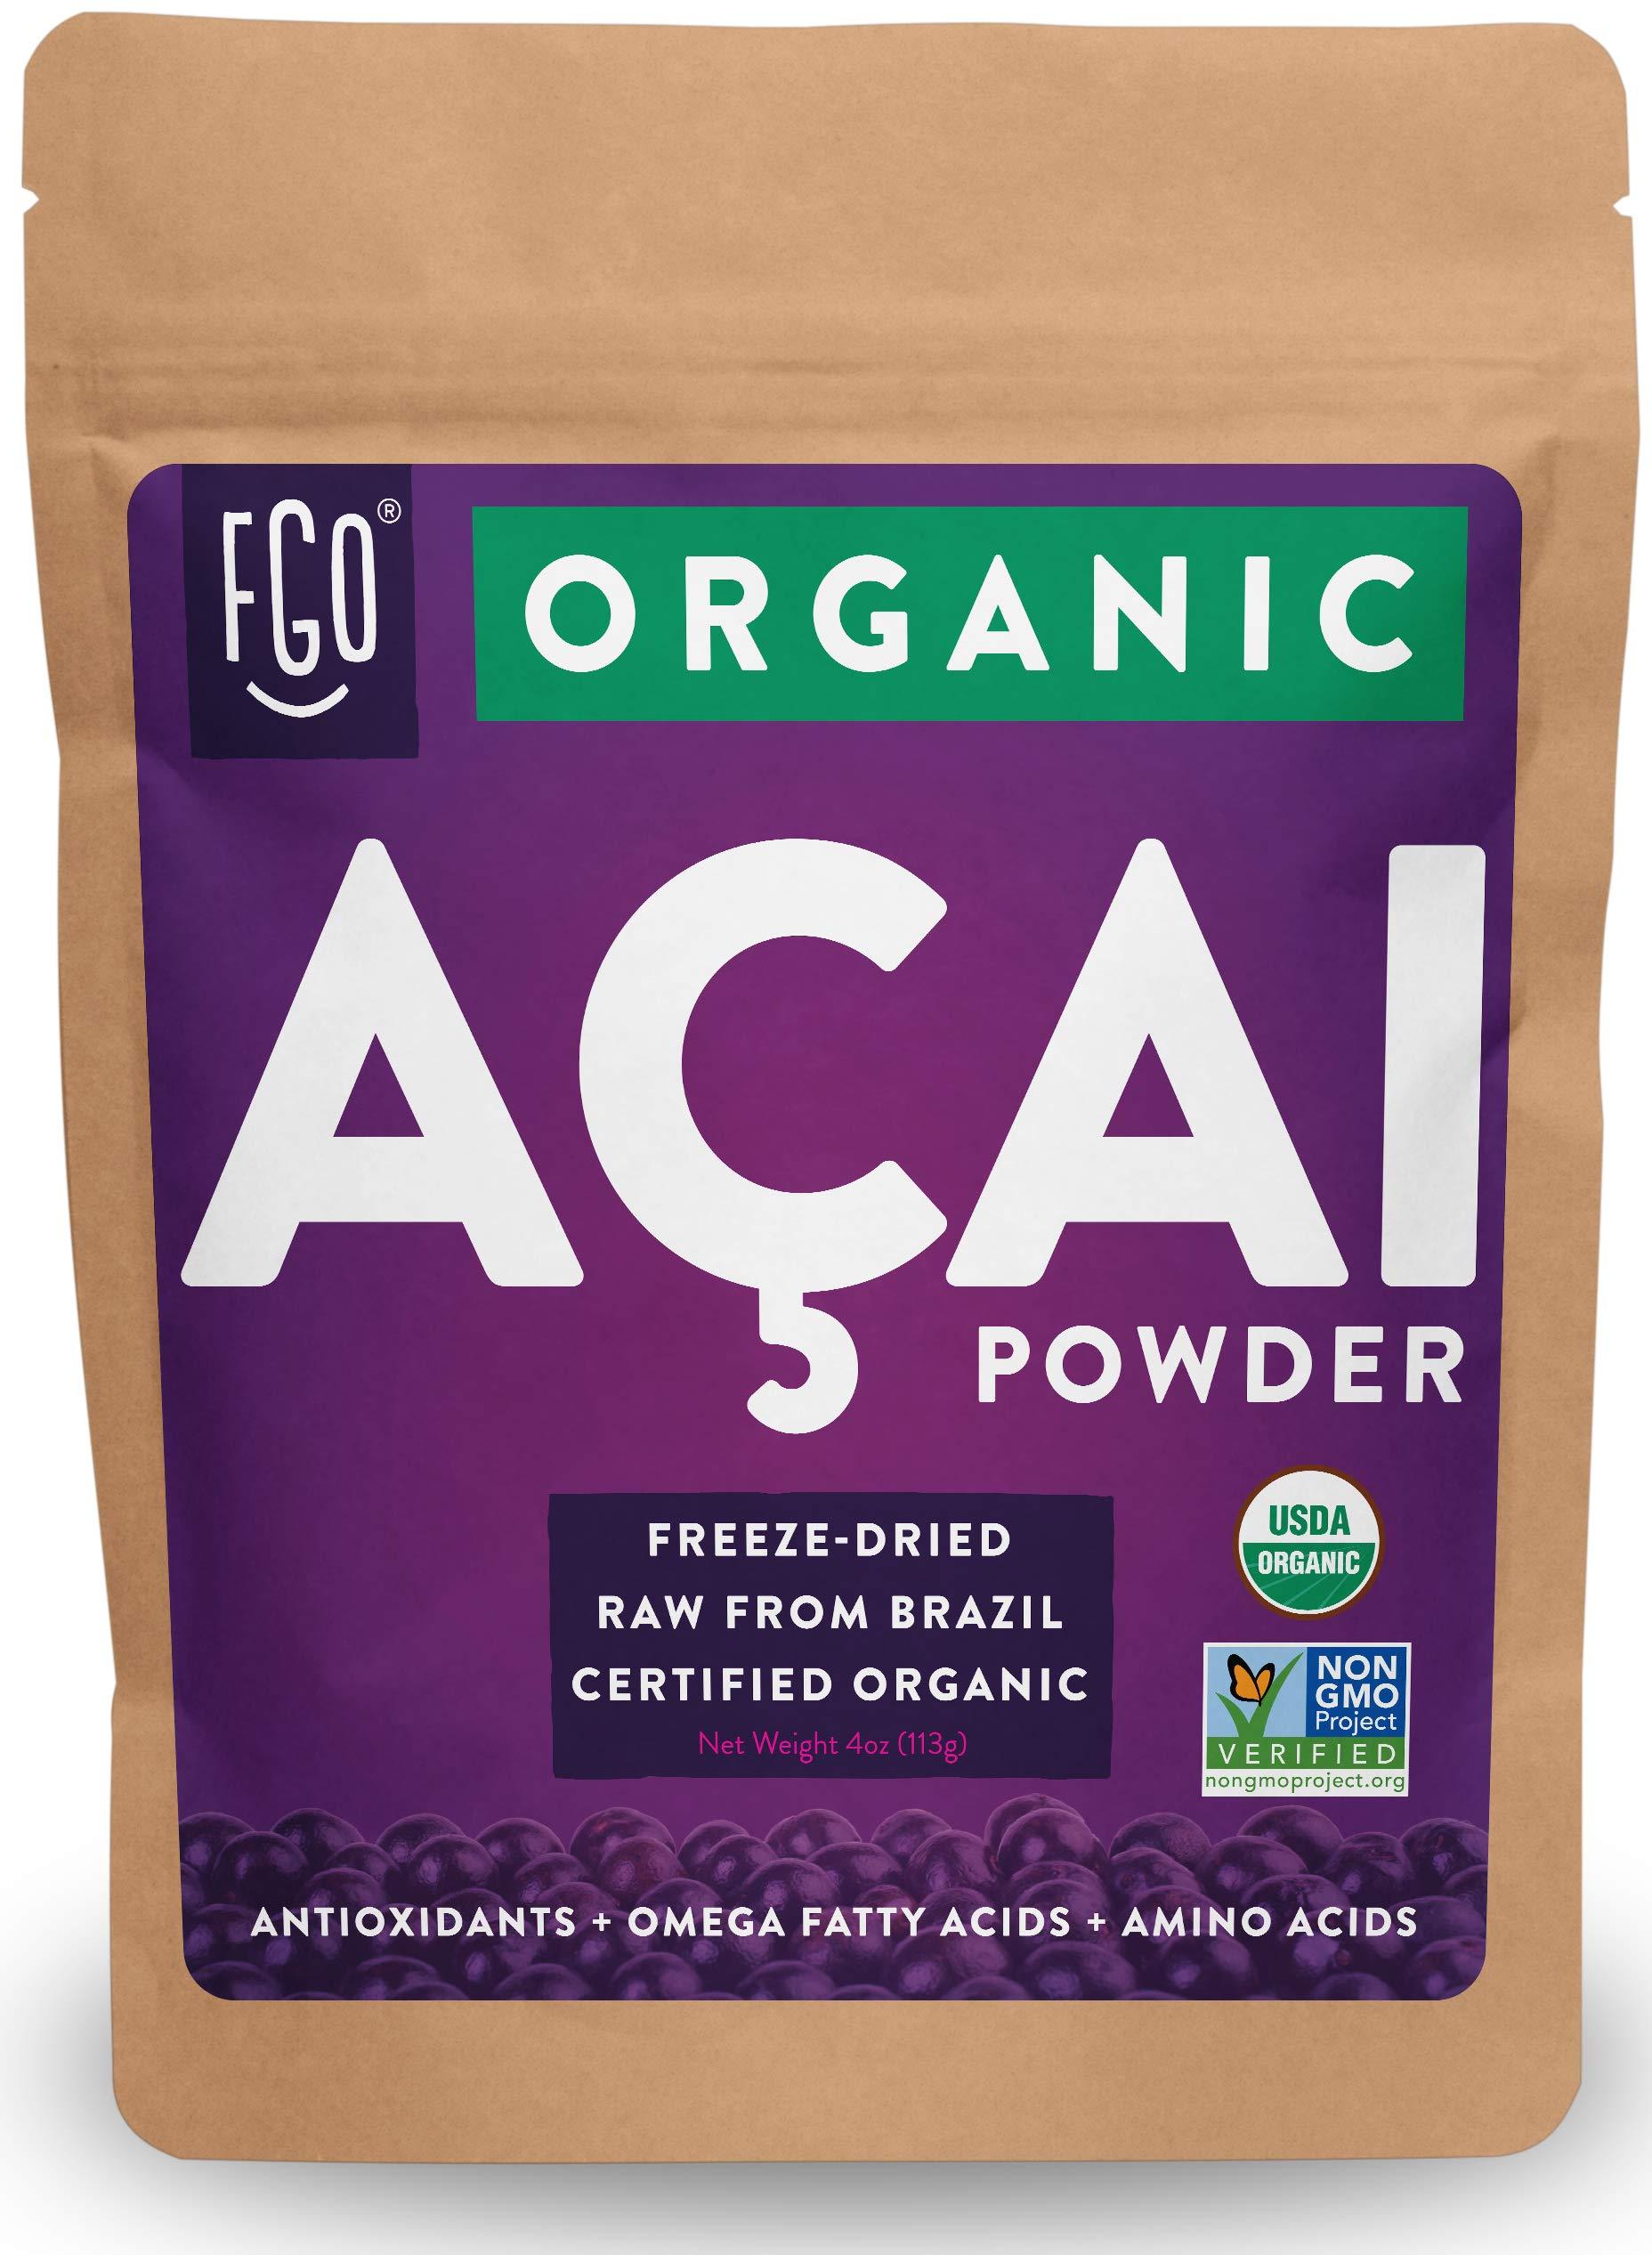 Organic ACAI Powder (Freeze-Dried)   4oz Resealable Kraft Bag   100% Raw Antioxidant Superfood Berry From Brazil   by FGO